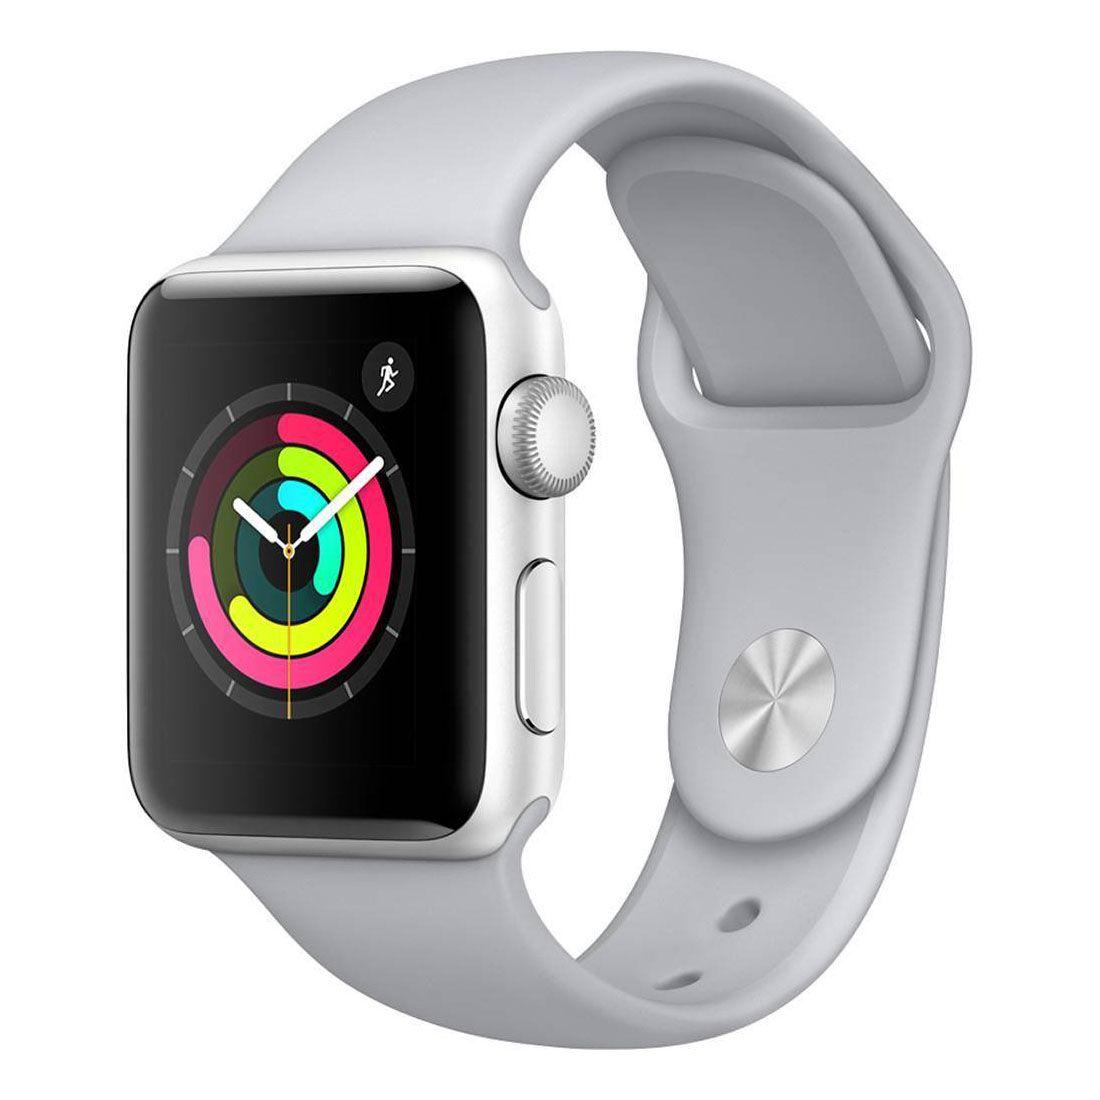 Relogio Apple Watch 3 Silver Aluminum Fog Sport Band Gray 38mm